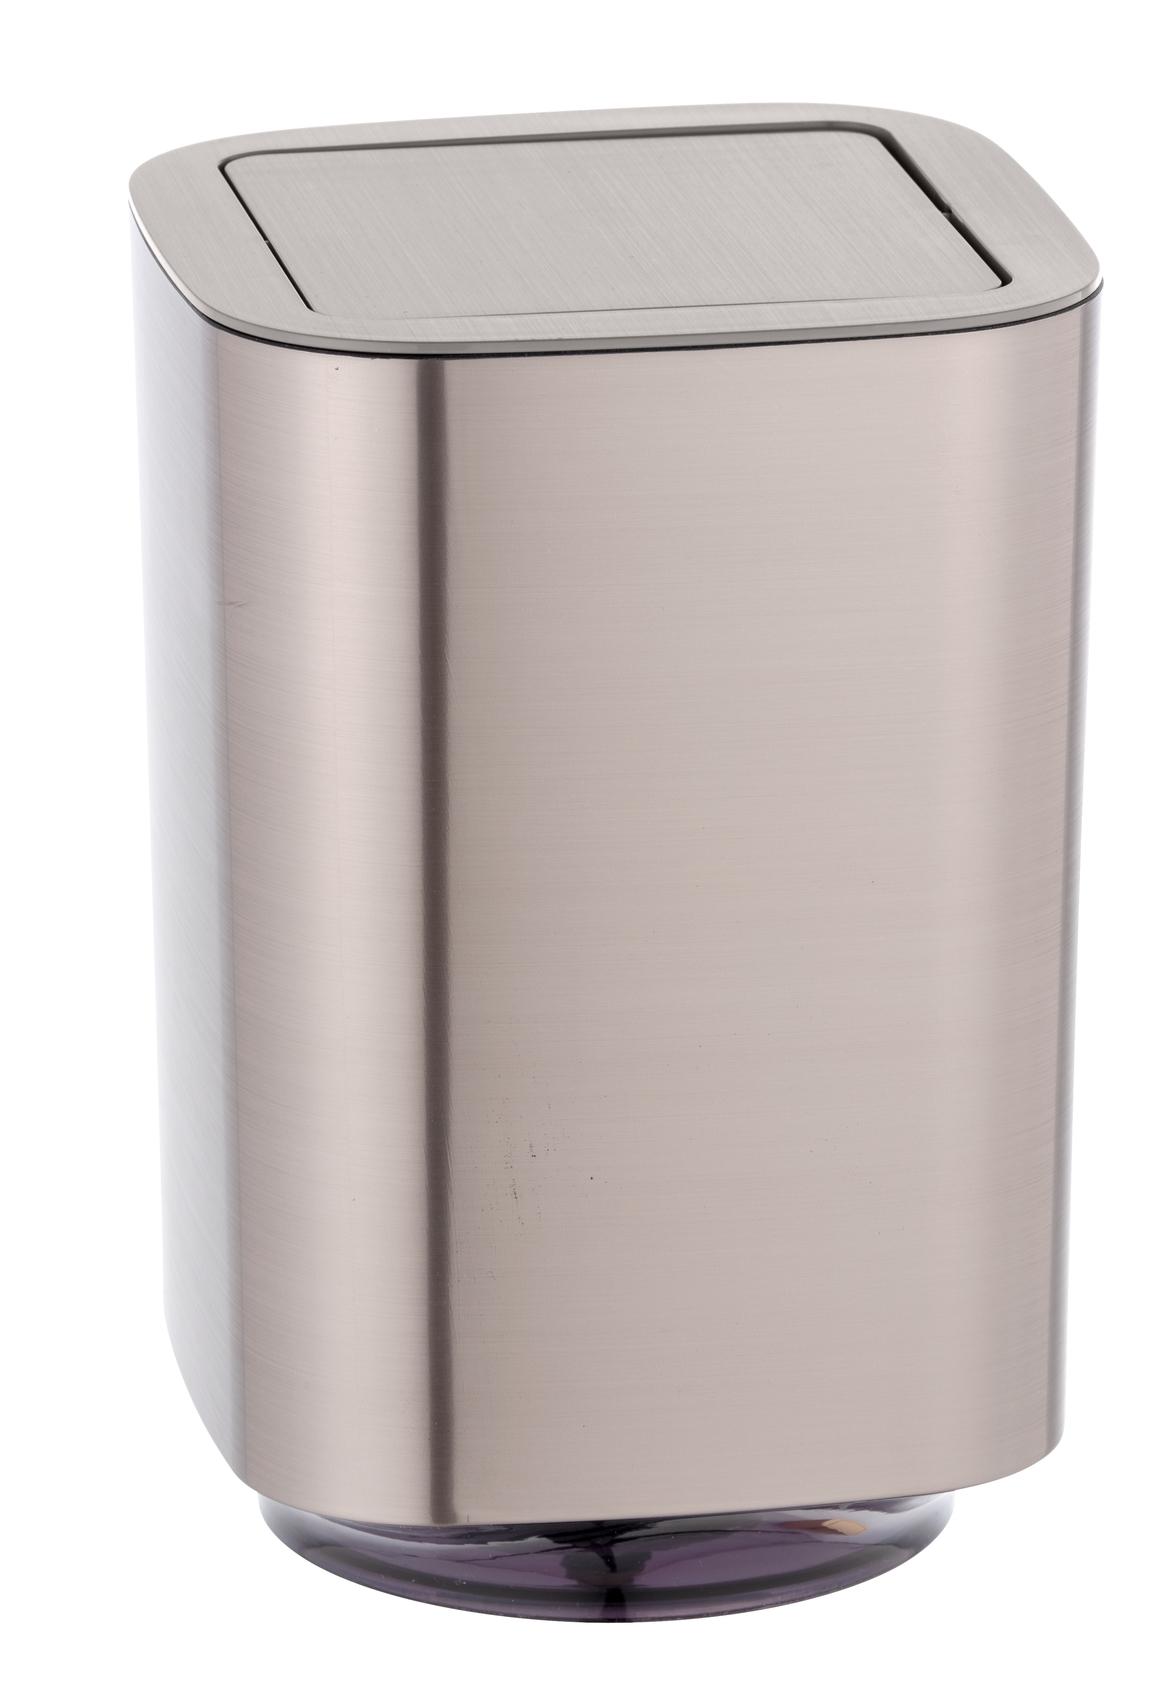 Cos de gunoi pentru baie, din plastic, Auron Argintiu, 5,5L, L17,2xl17,2xH25,5 cm imagine